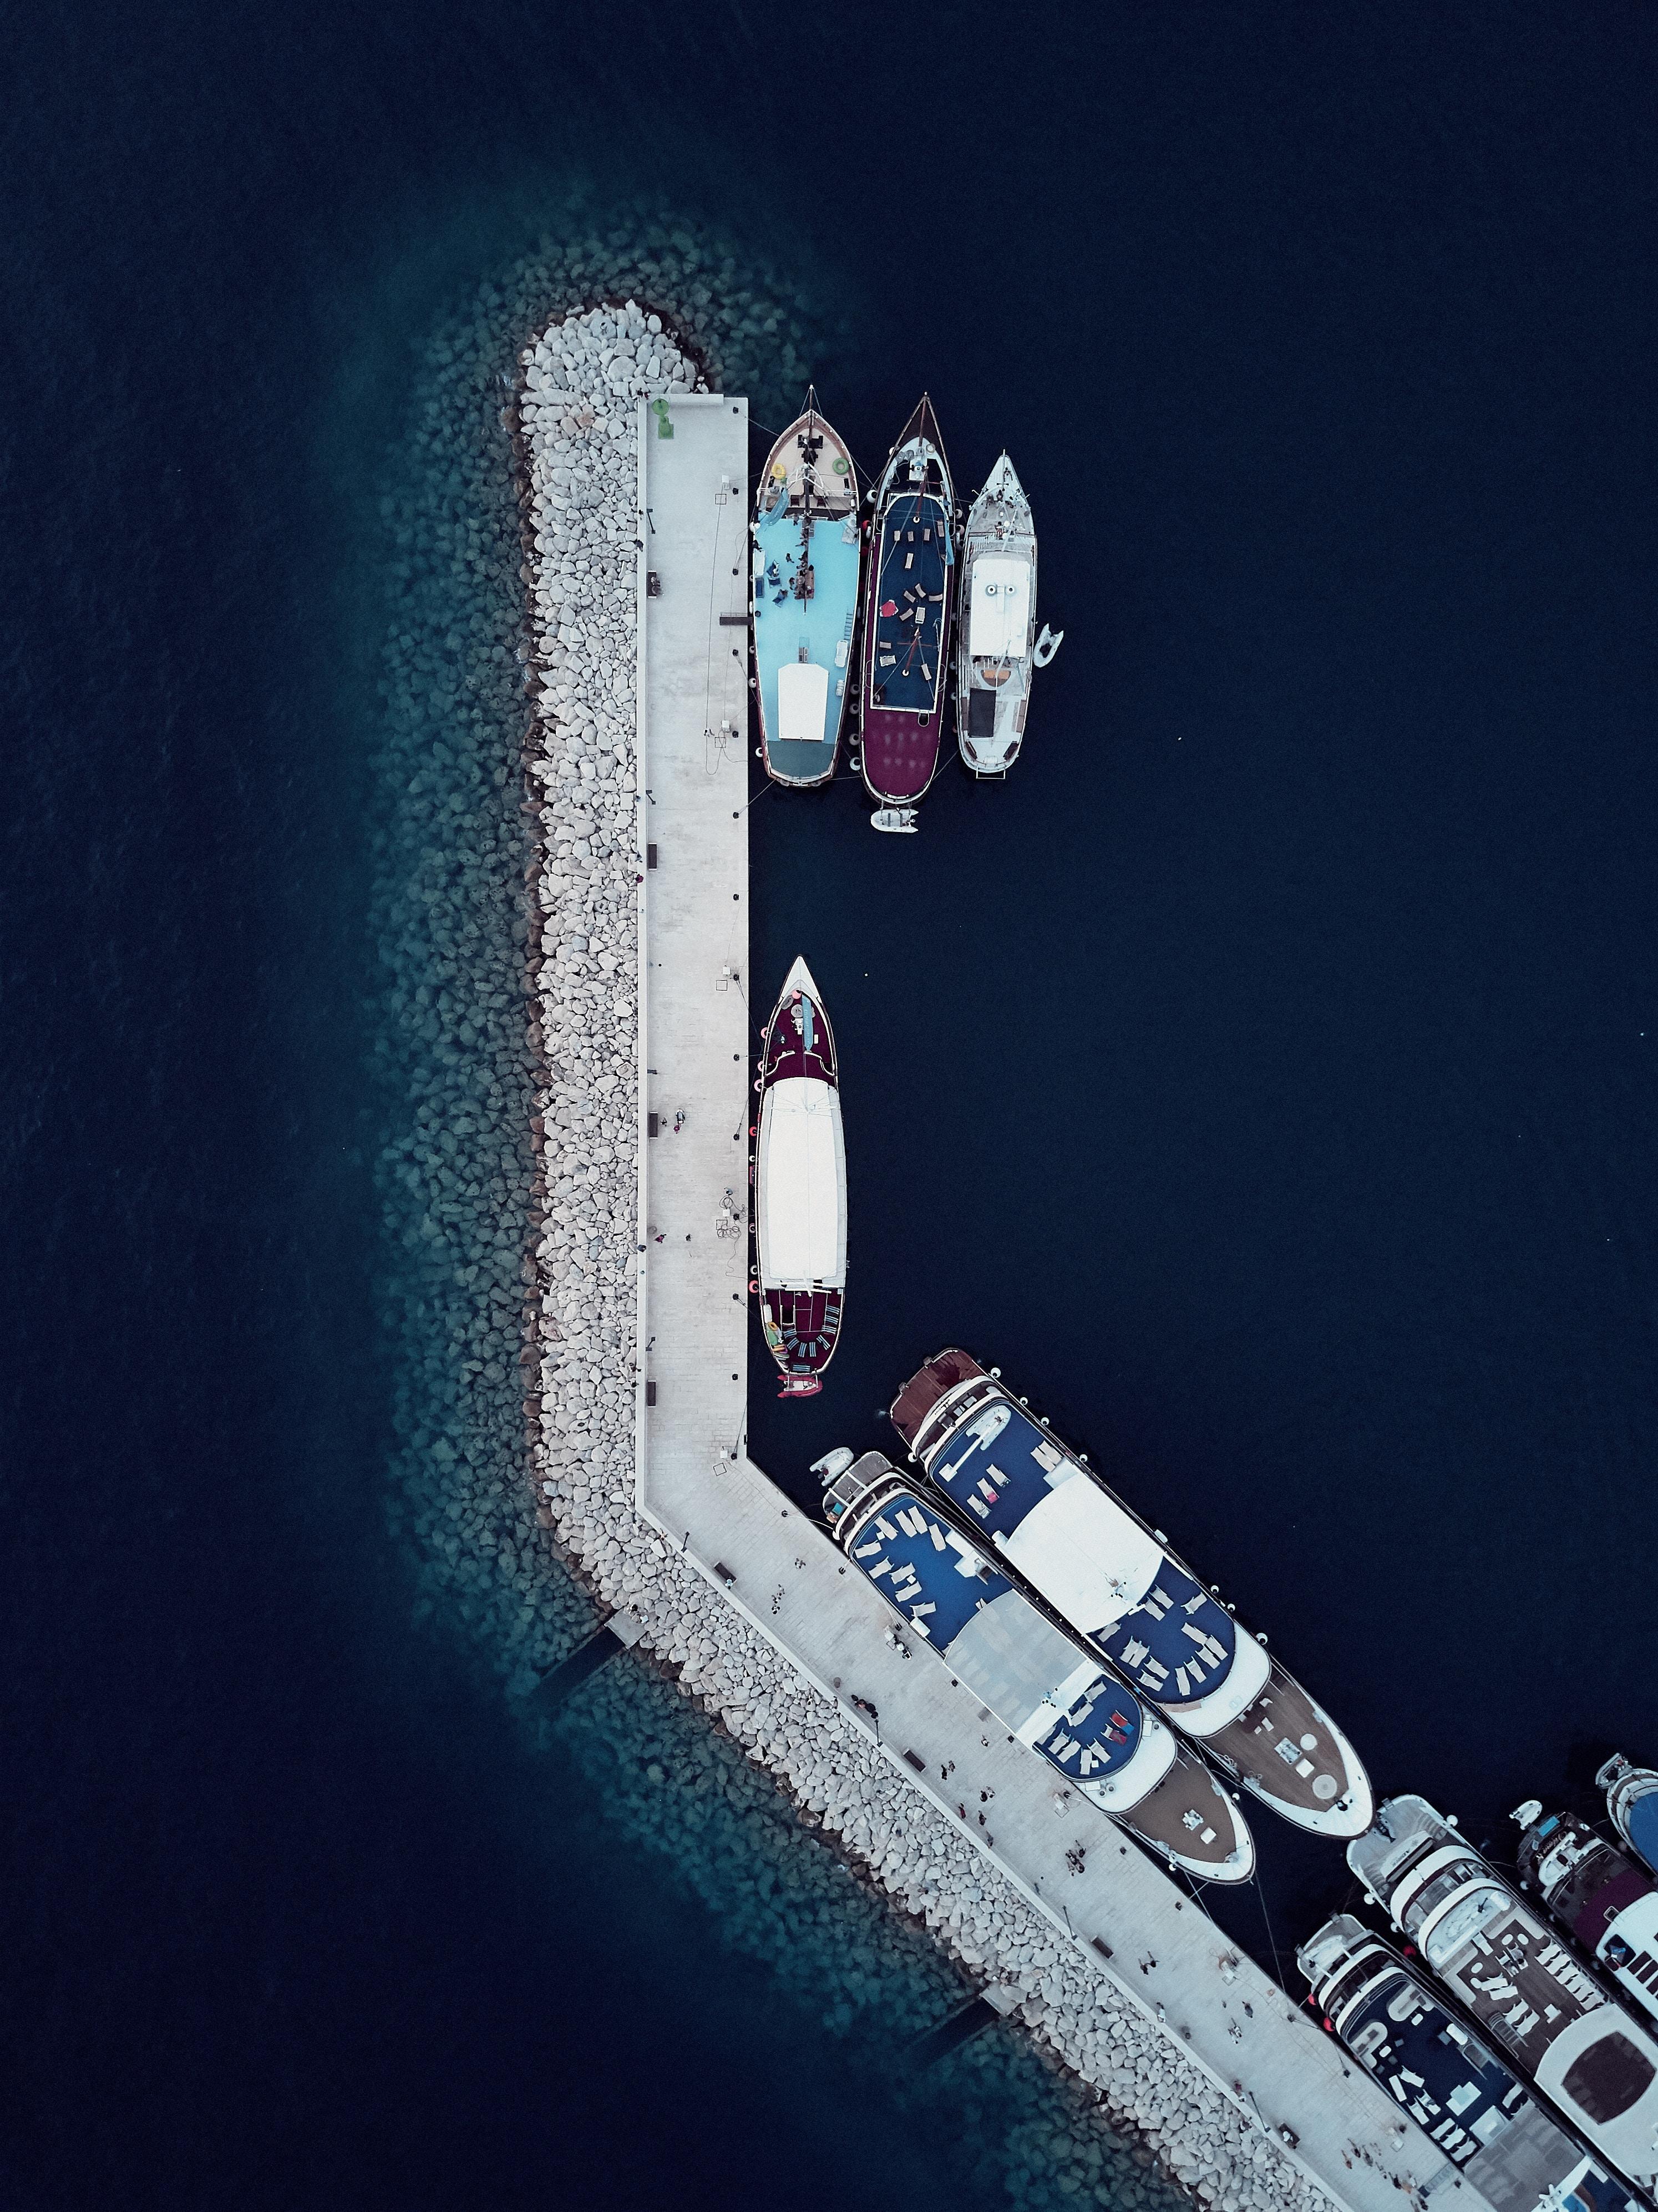 88139 Заставки и Обои Лодки на телефон. Скачать Природа, Пирс, Причал, Лодки, Вид Сверху картинки бесплатно